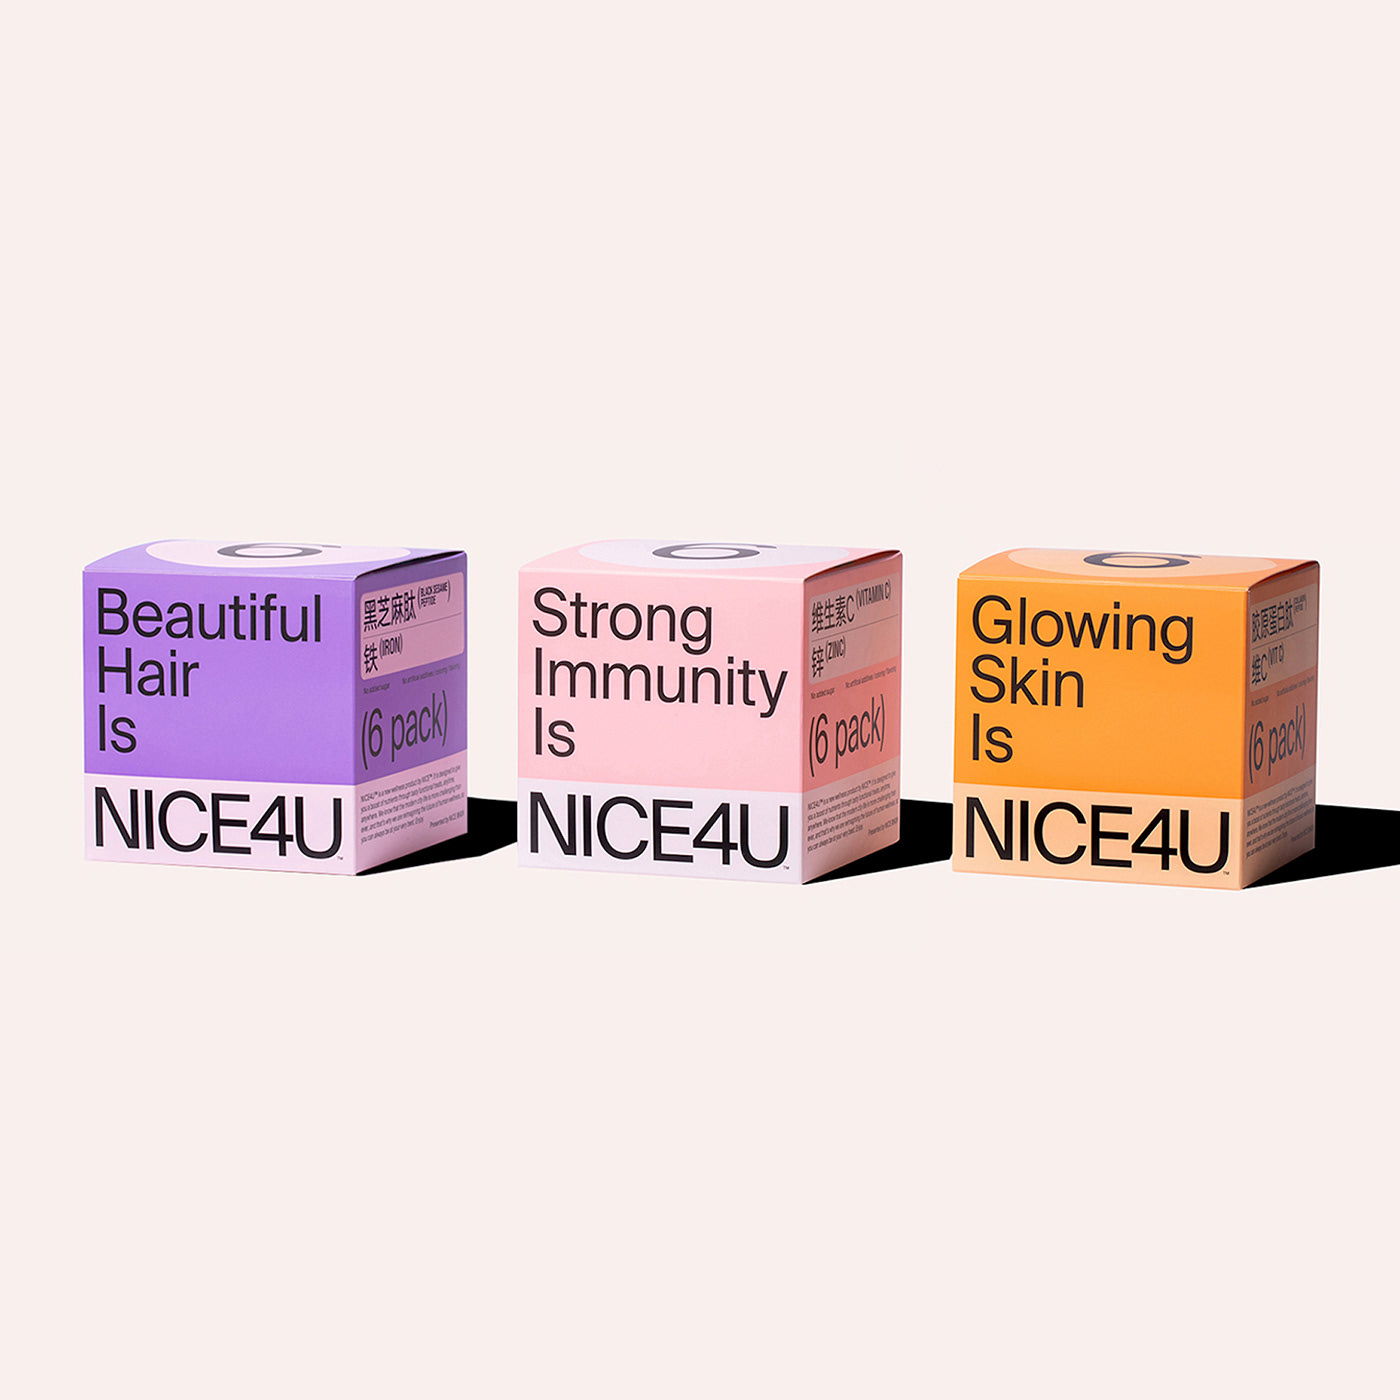 Beverage Design colorful DESIGN cosmetics gummy healthy food Modern Design packagedesign Packaging Tropical Design